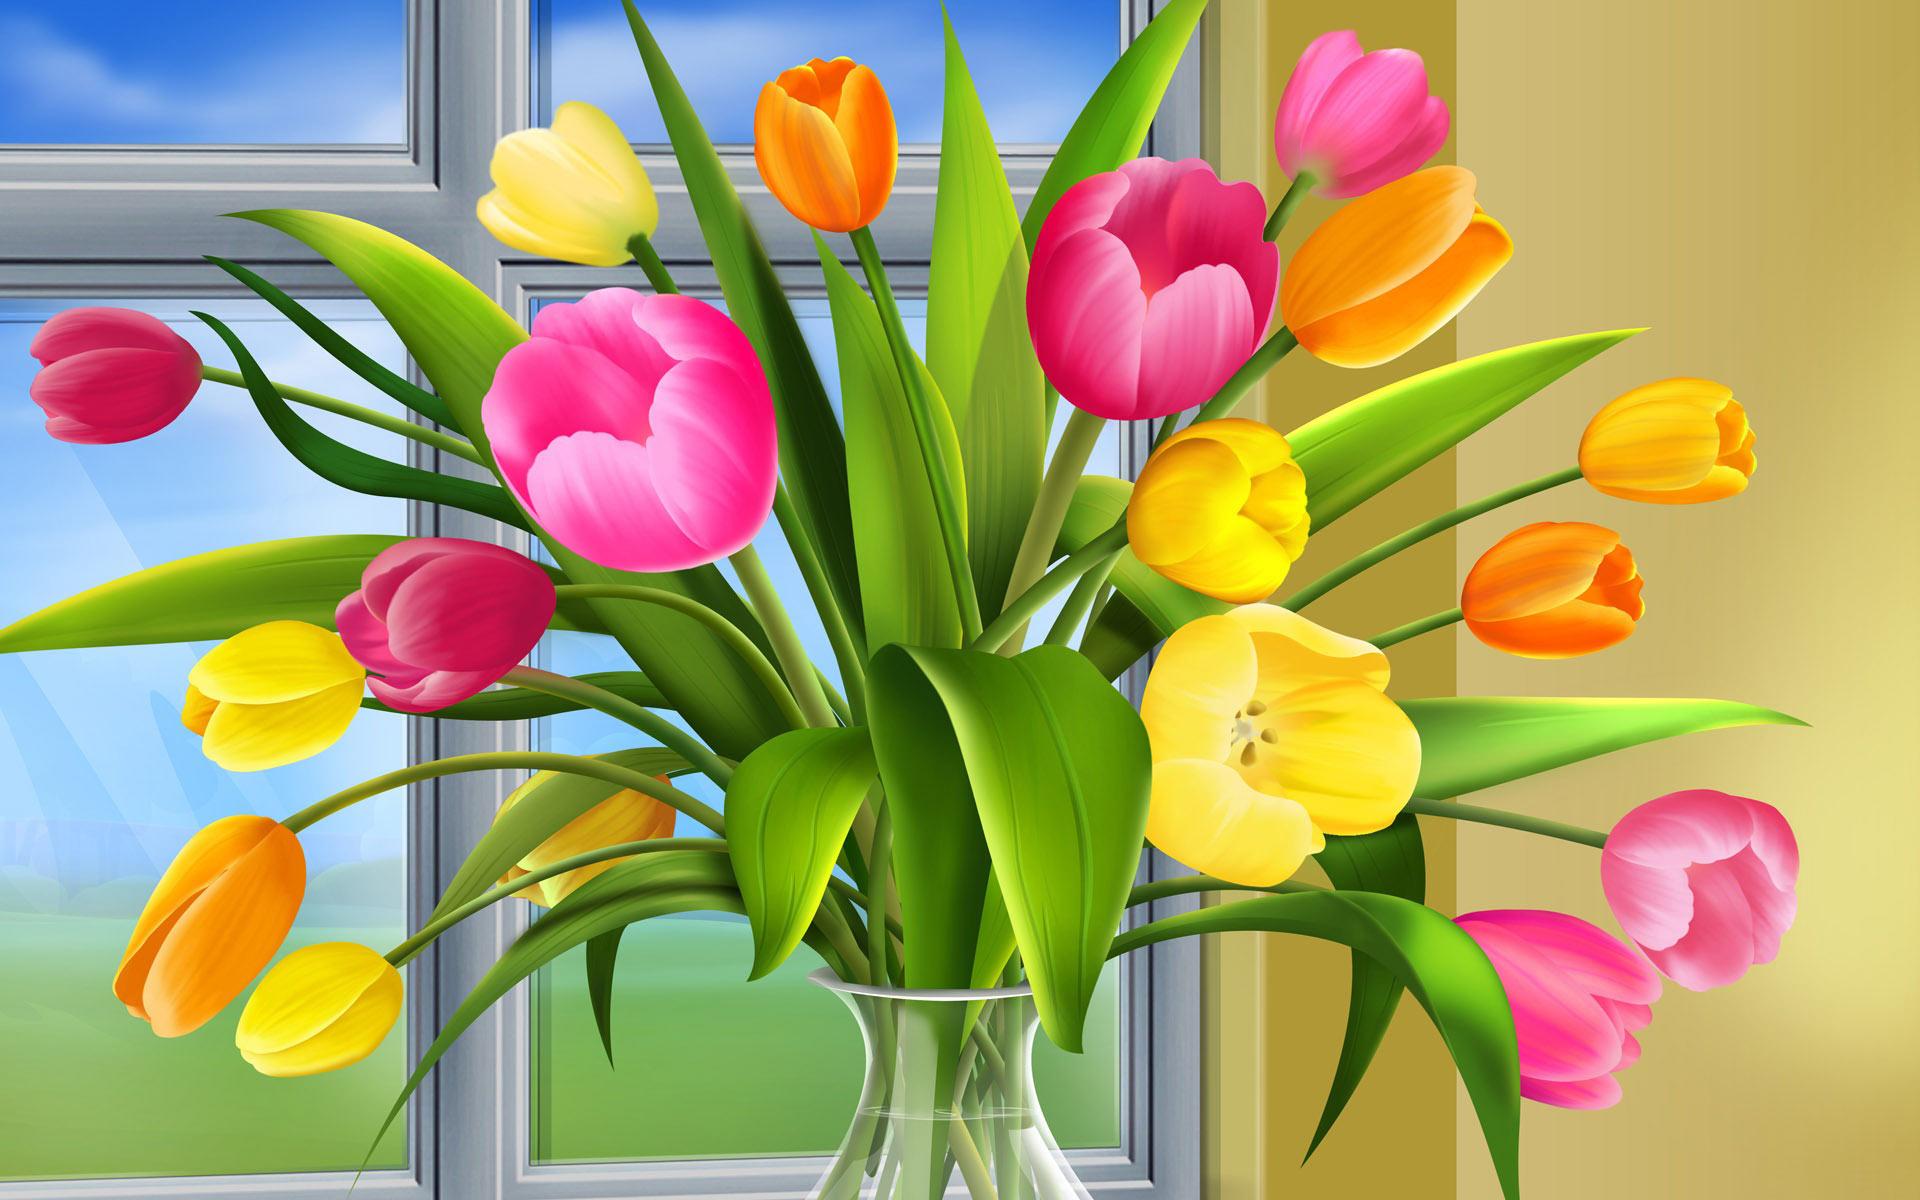 spring-desktop-gallery-windows-tulips-bouquet-280401